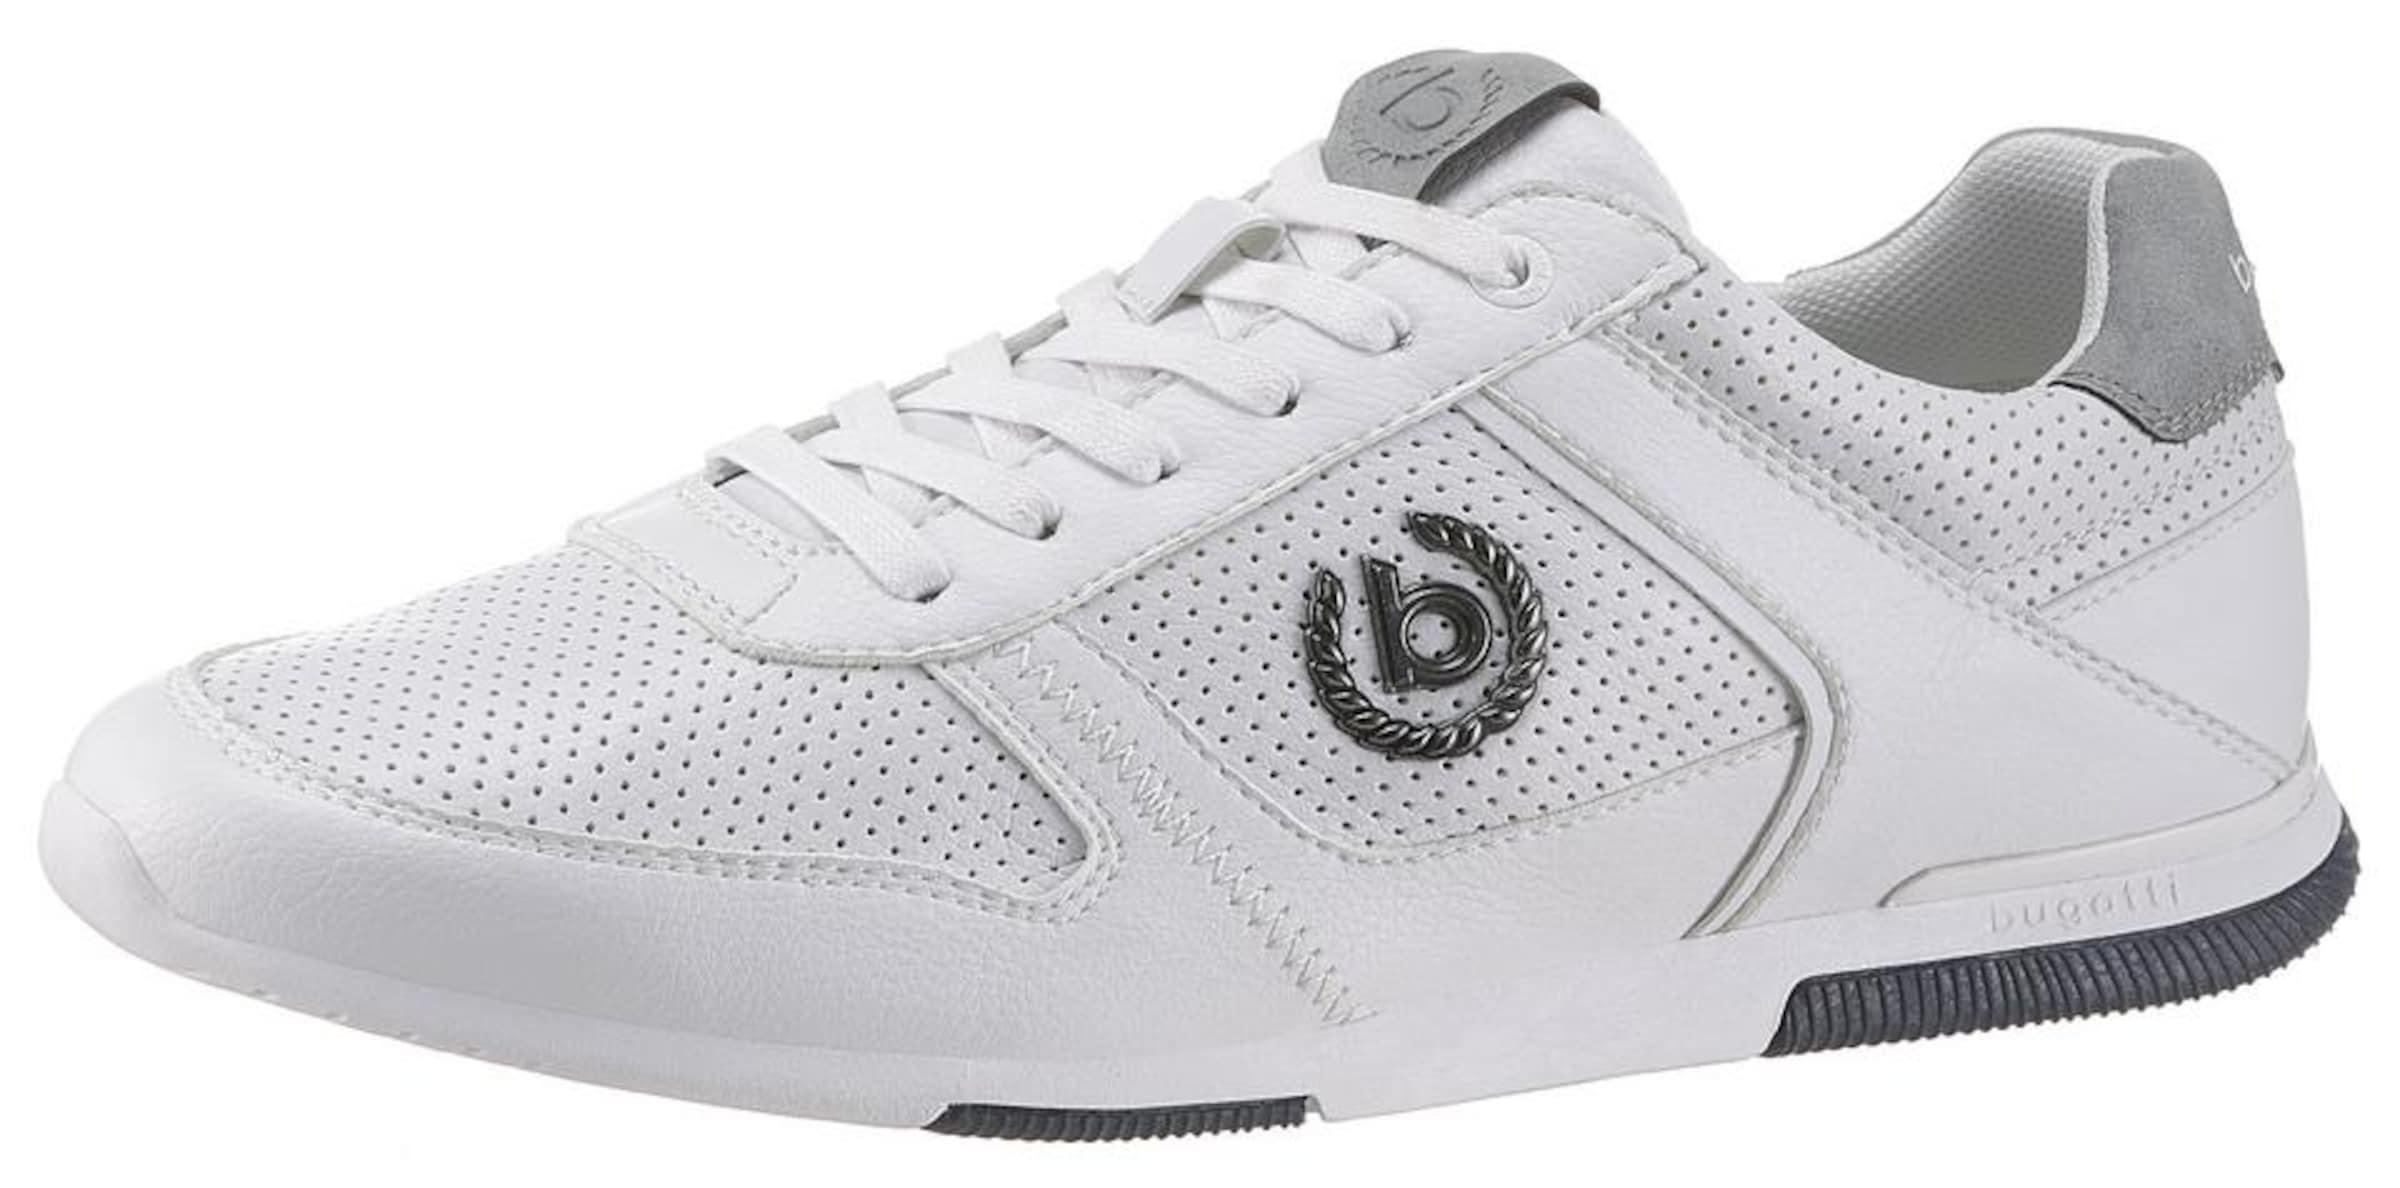 Bugatti Sneaker In 'report' 'report' Sneaker In Weiß Weiß Sneaker Bugatti In 'report' Bugatti N8mw0nv